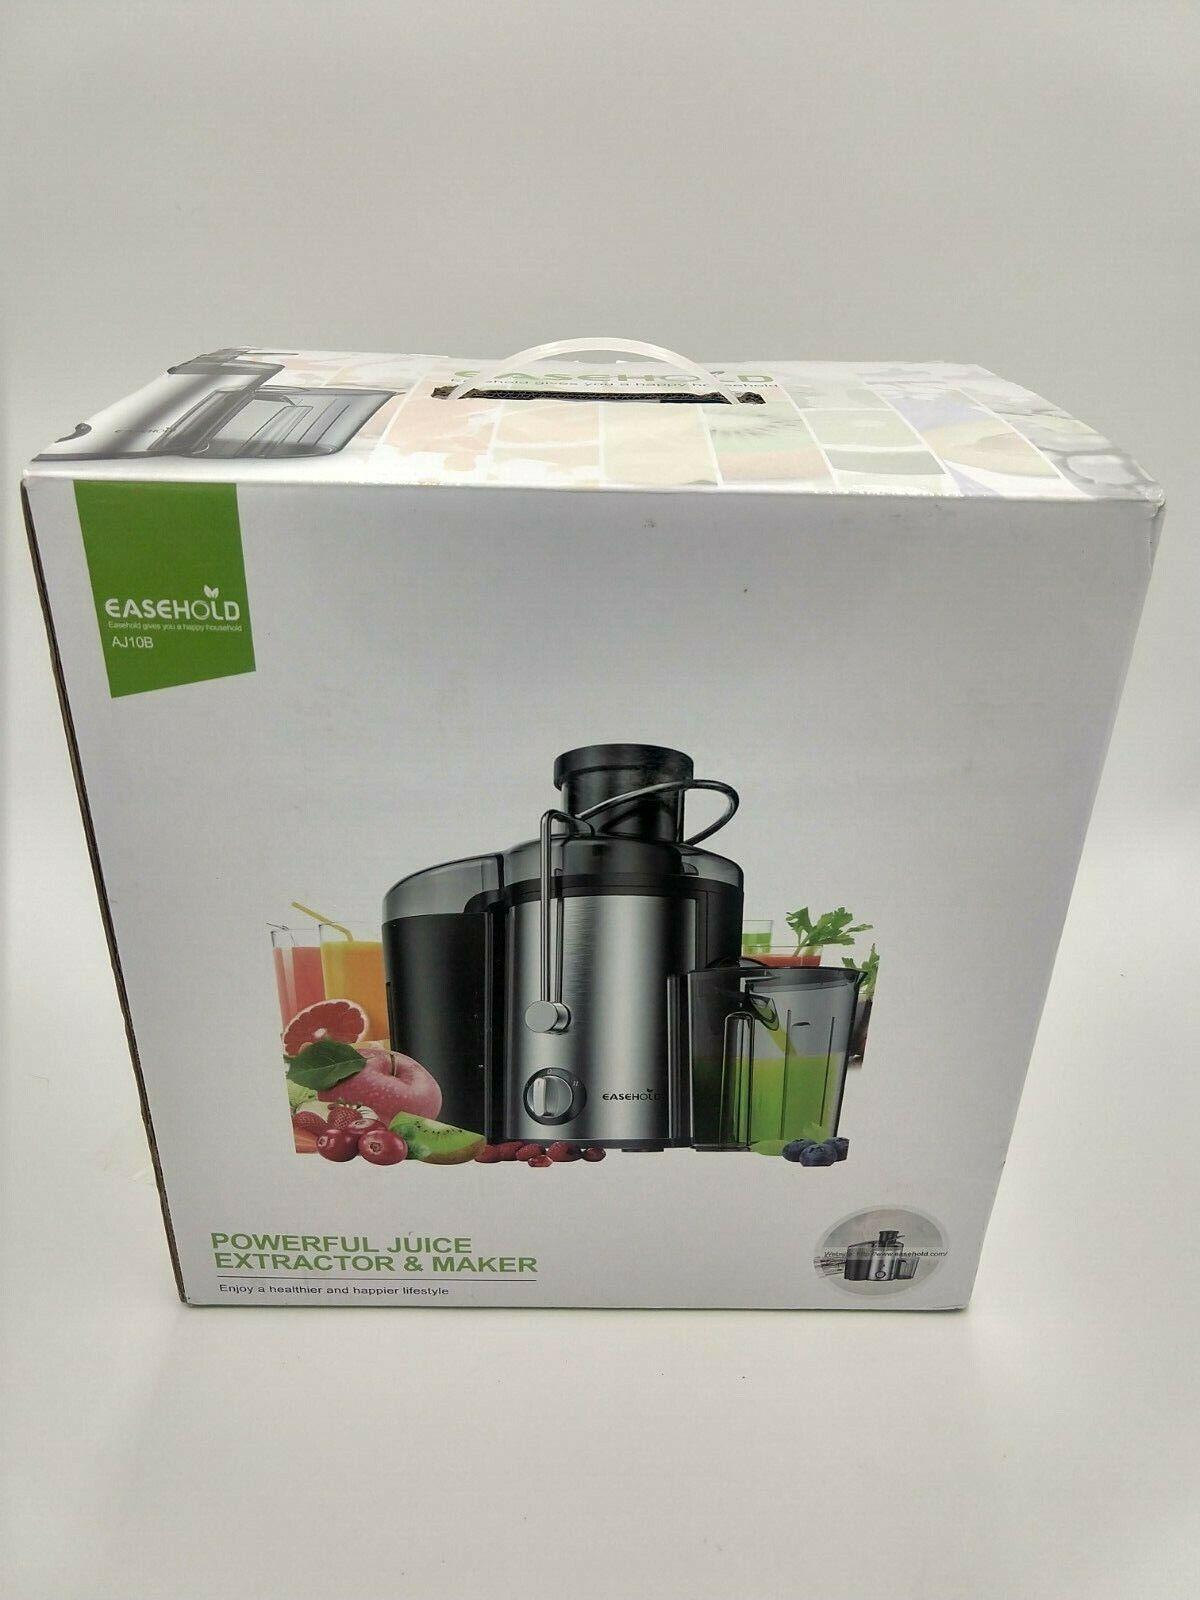 EASEHOLD AJ10B POWERFUL Juice Extractor